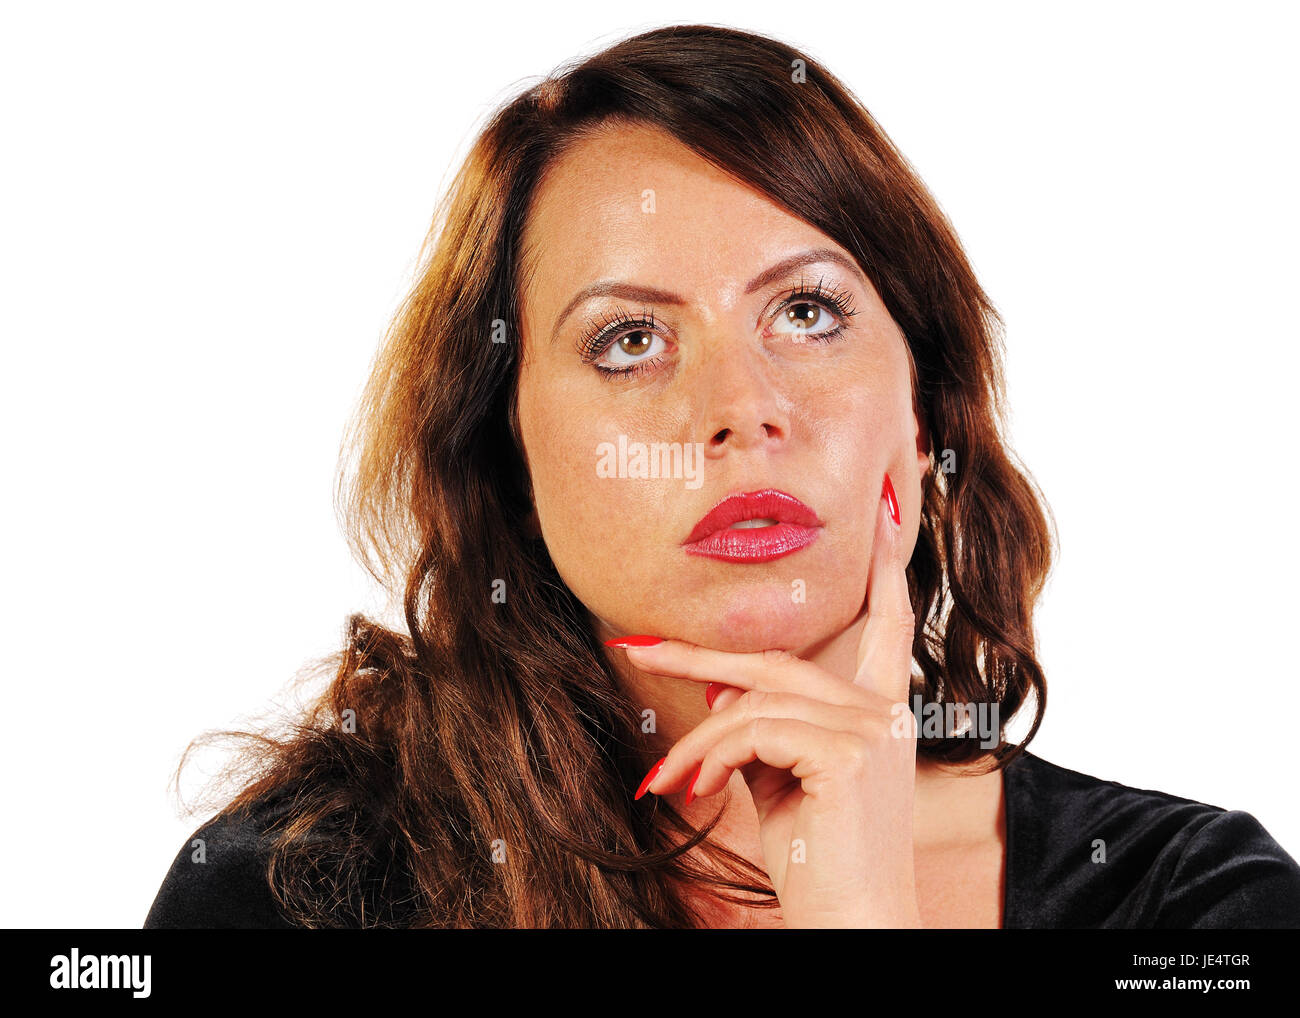 Frau denkt nach Stock Photo